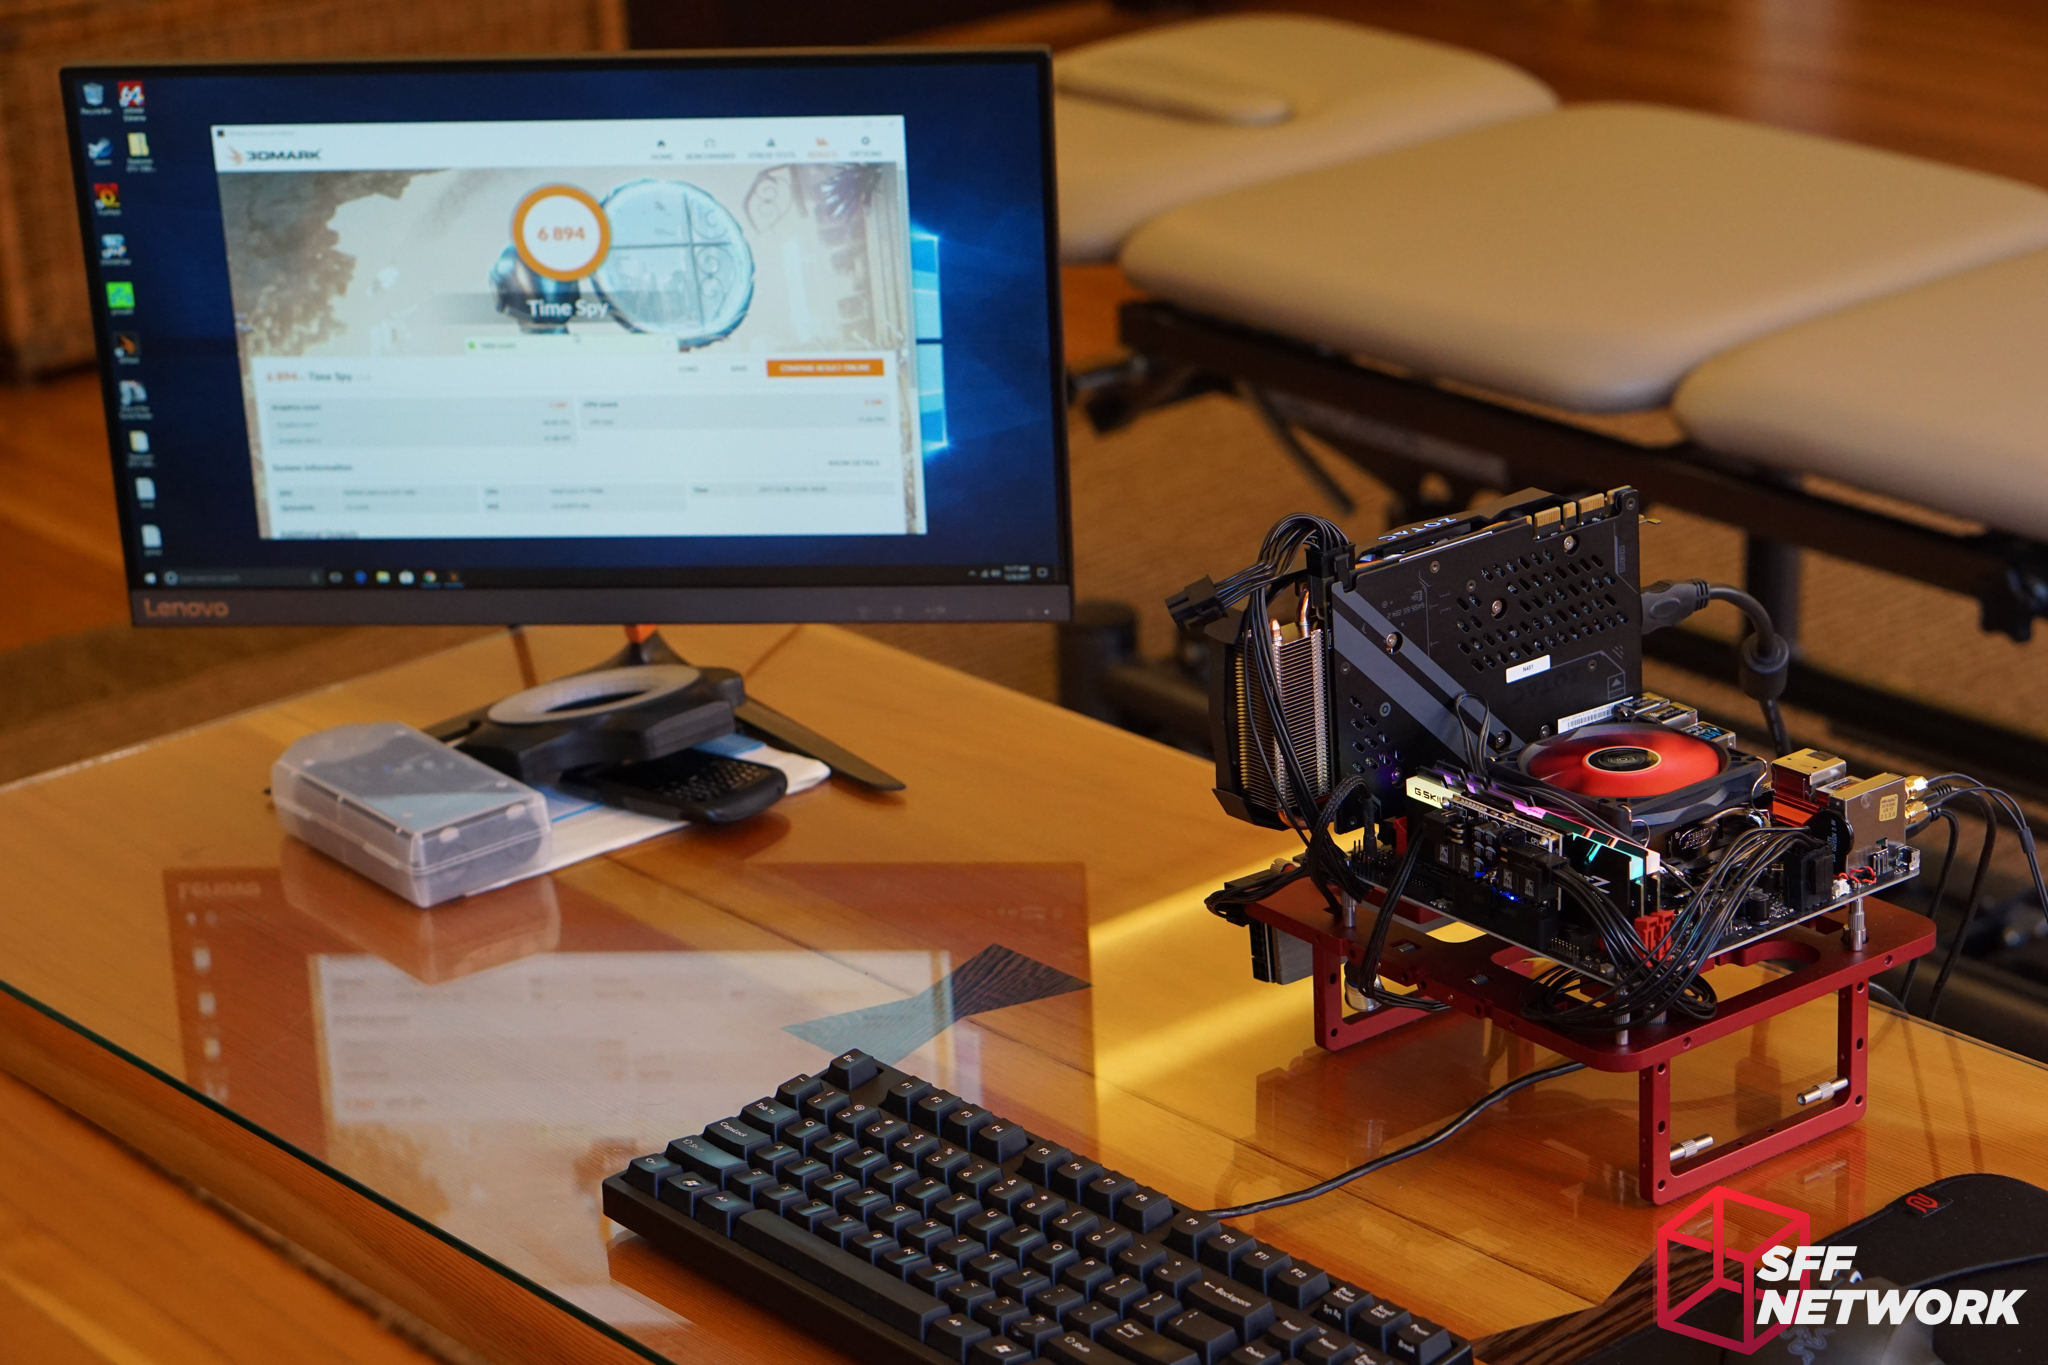 ASRock's DeskMini GTX1080 Reviewed - Epic Performance